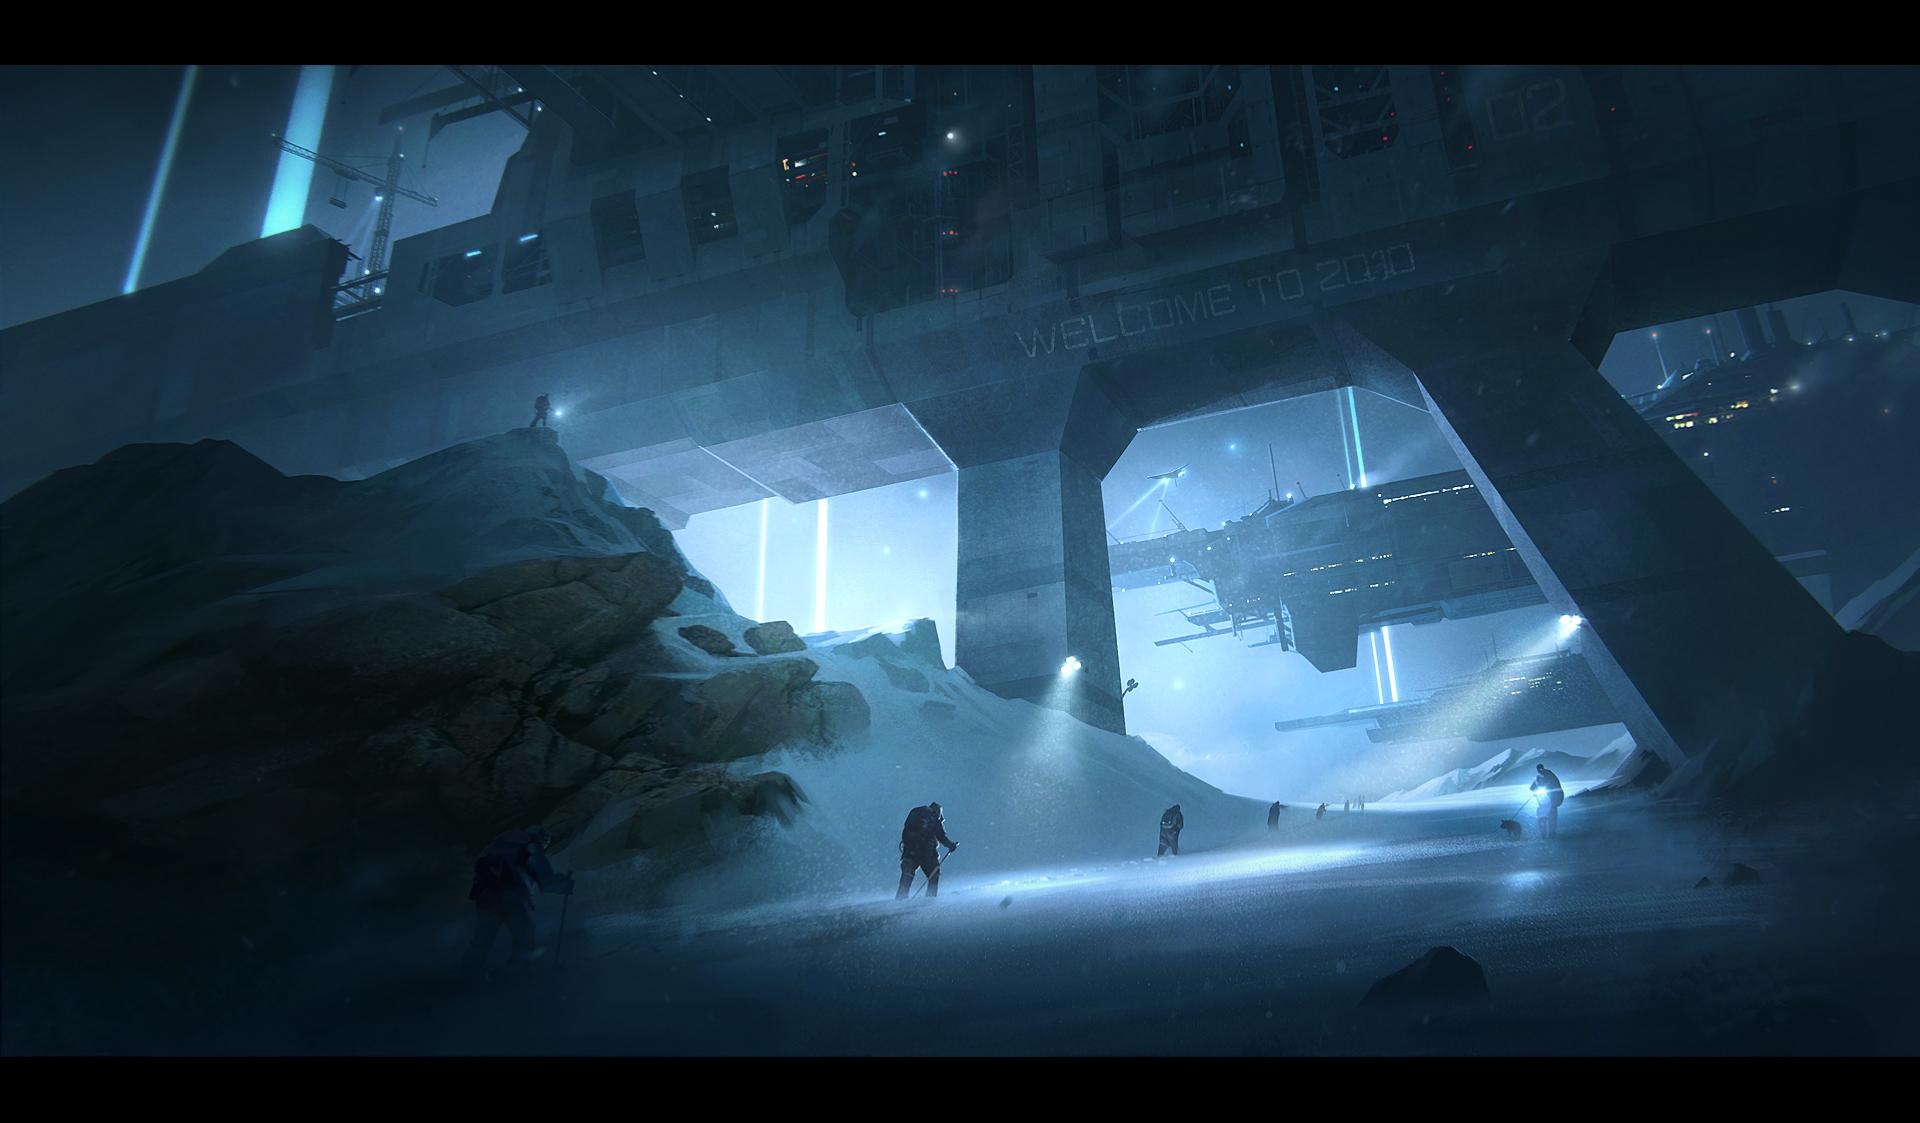 Alpha Coders Wallpaper Abyss Sci Fi Landscape 113130